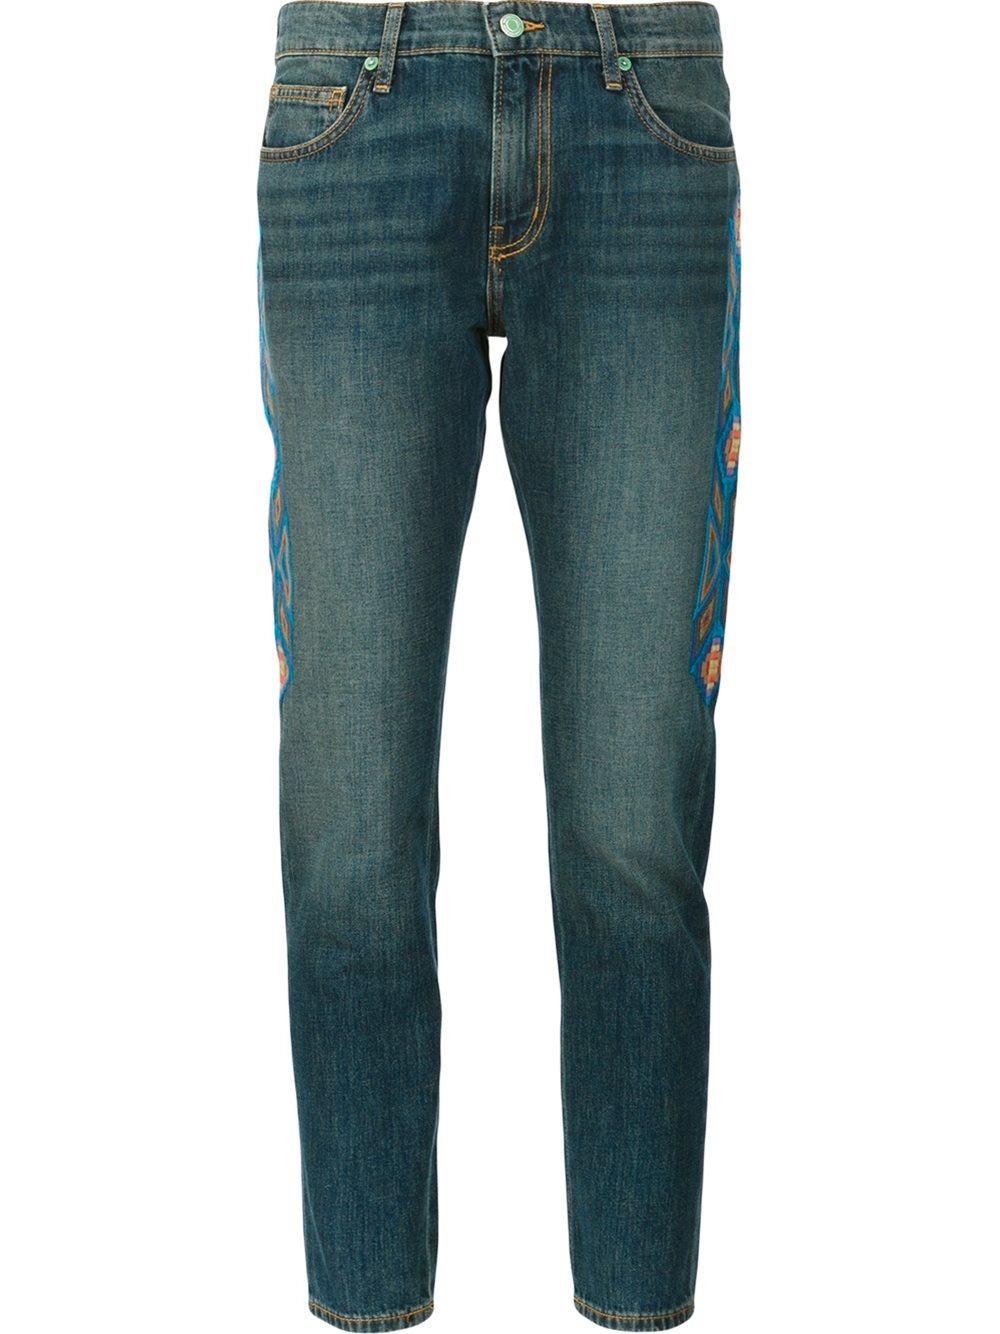 Sandrine rose embroidered skinny boyfriend jeans in blue